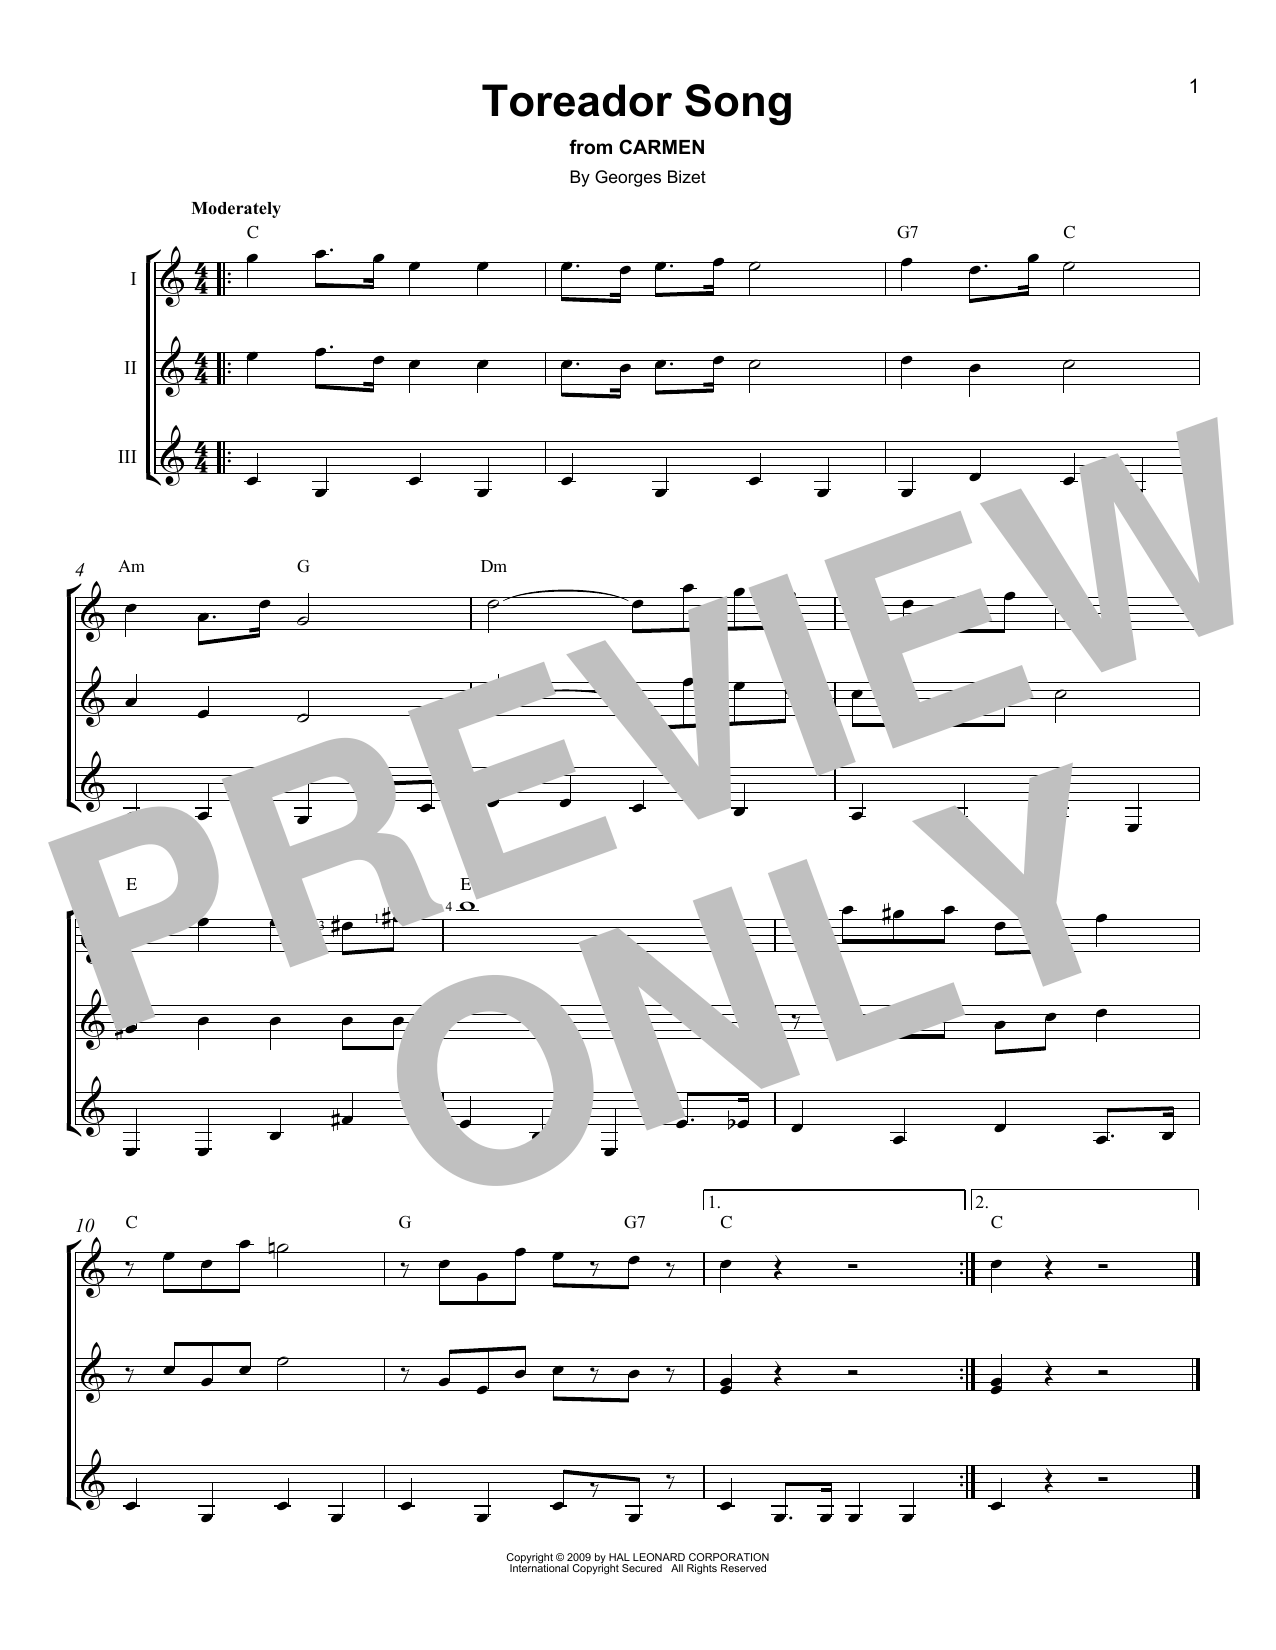 Toreador's Song (from Carmen) sheet music